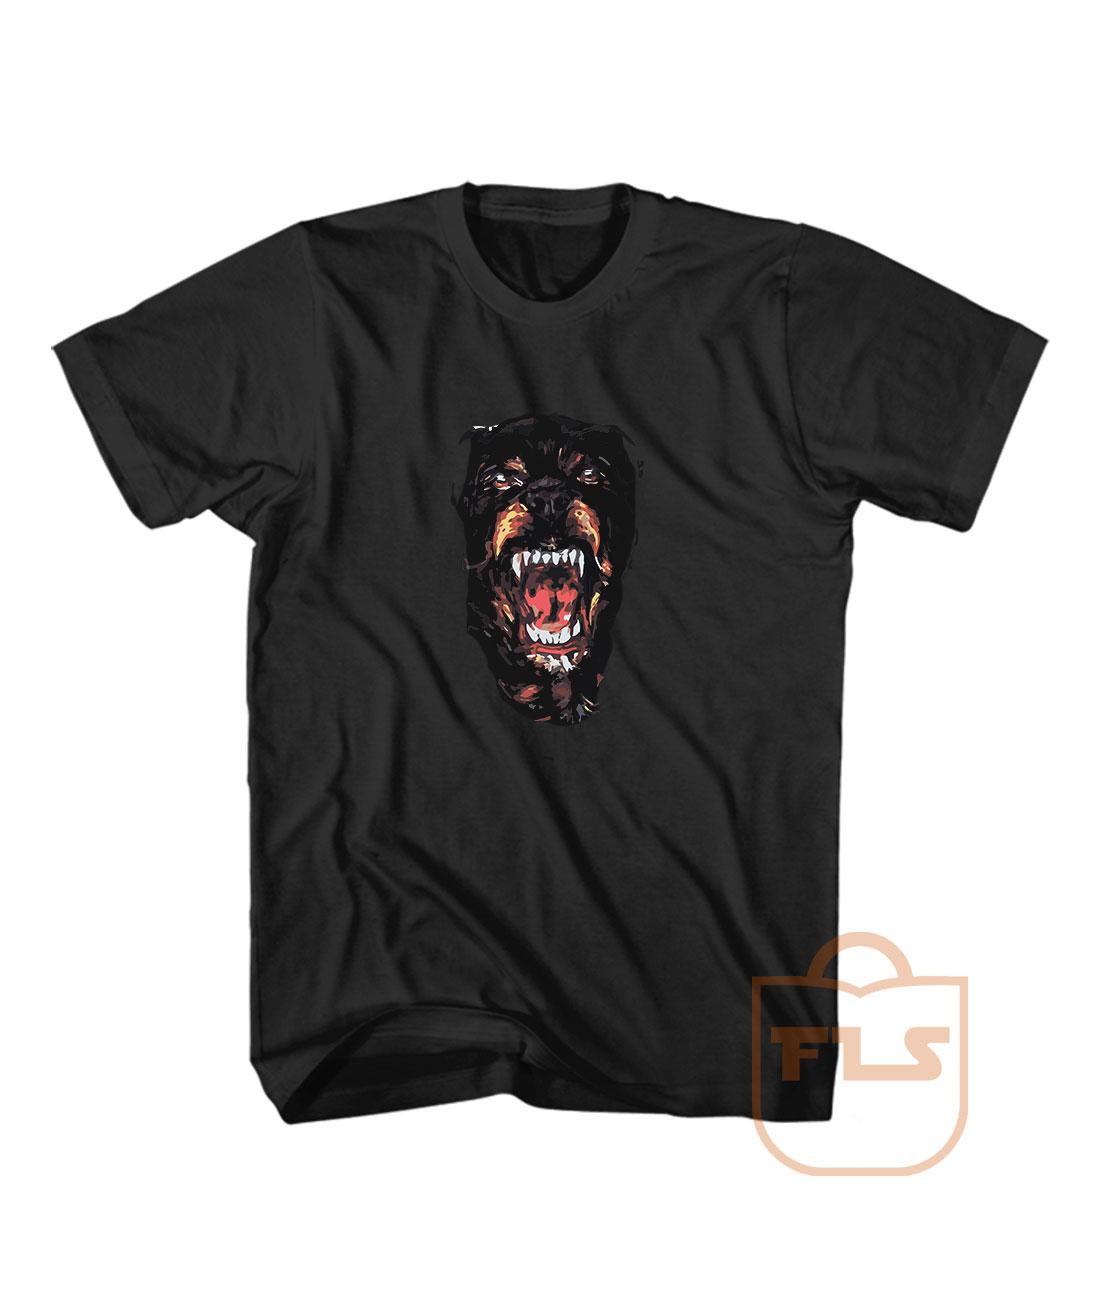 0e743257e Rottweiler Doberman T Shirt , Rottweiler Givenchy T Shirt - Ferolos.com